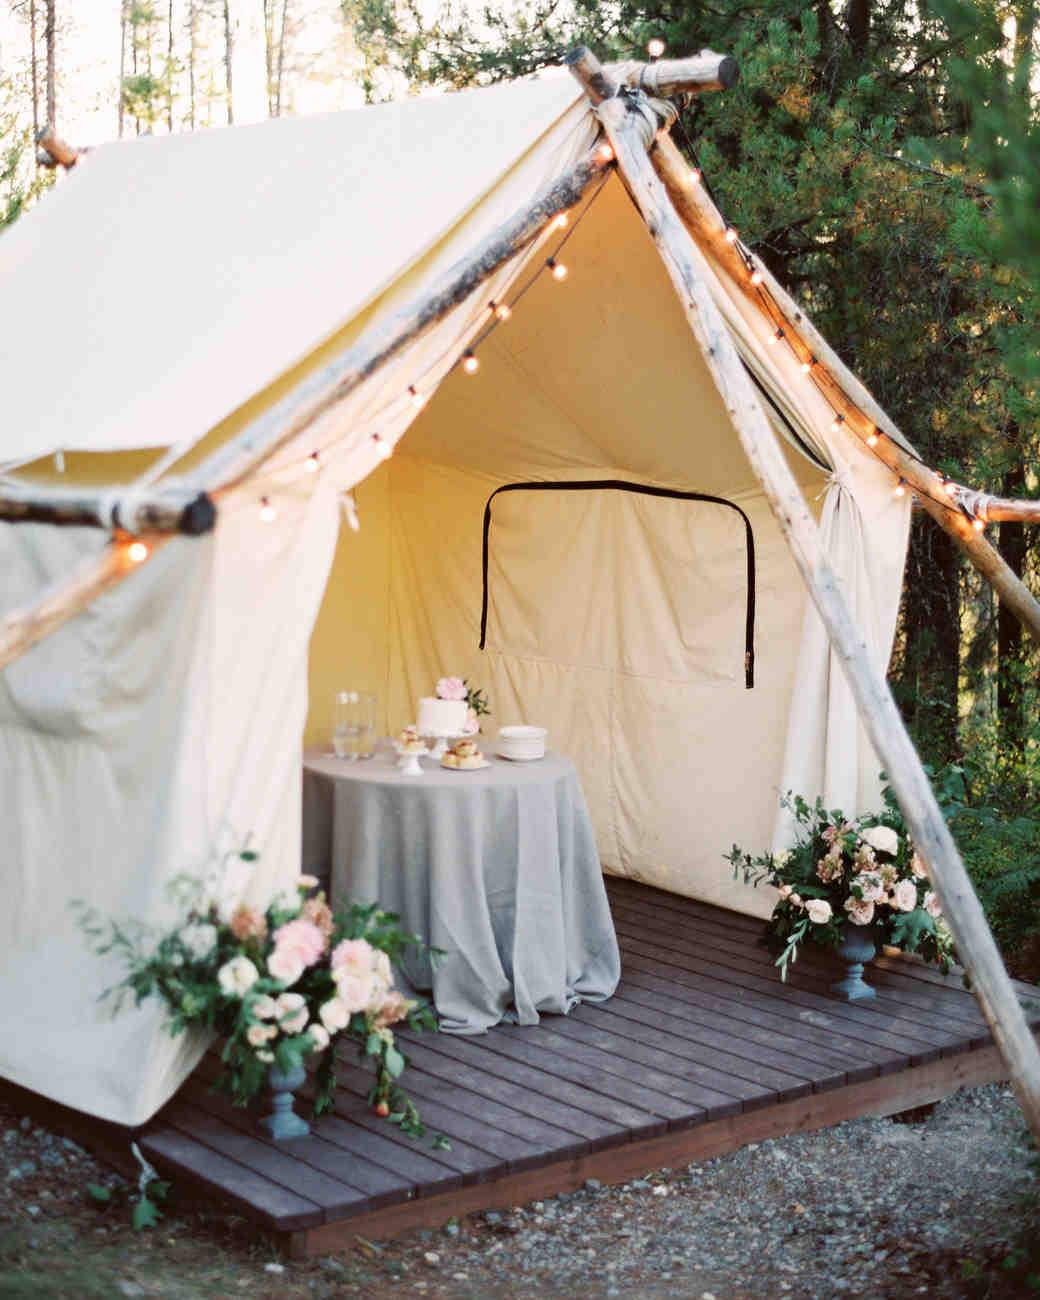 28 Tent Decorating Ideas That Will Upgrade Your Wedding Reception  Martha Stewart Weddings